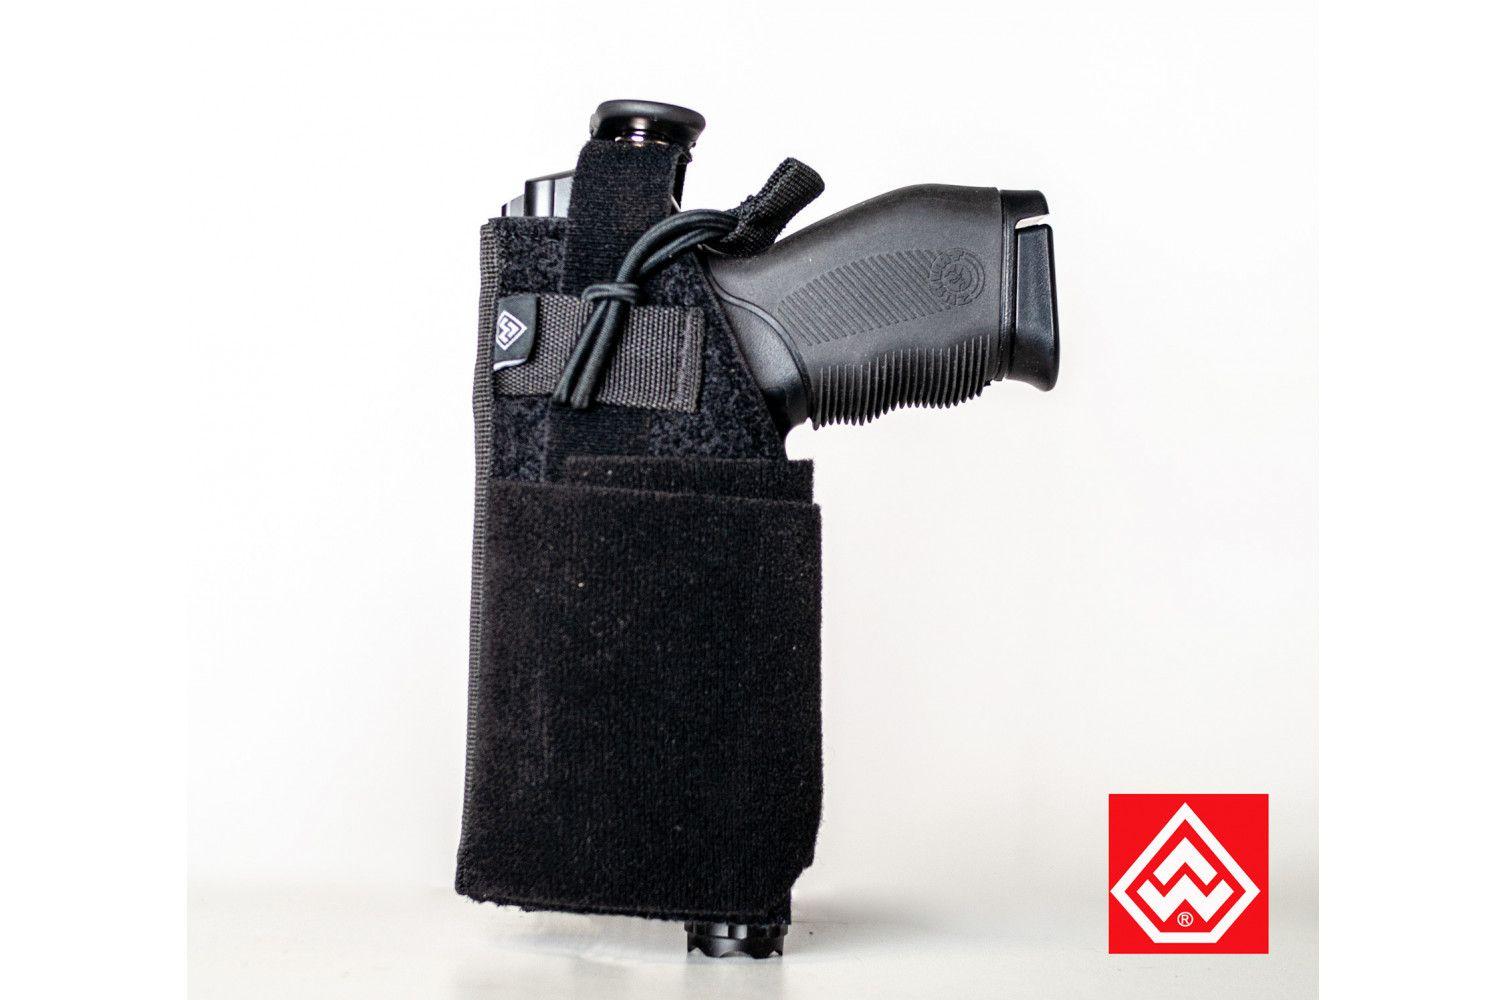 Coldre Police MOLLE Canhoto para Pistola - Black